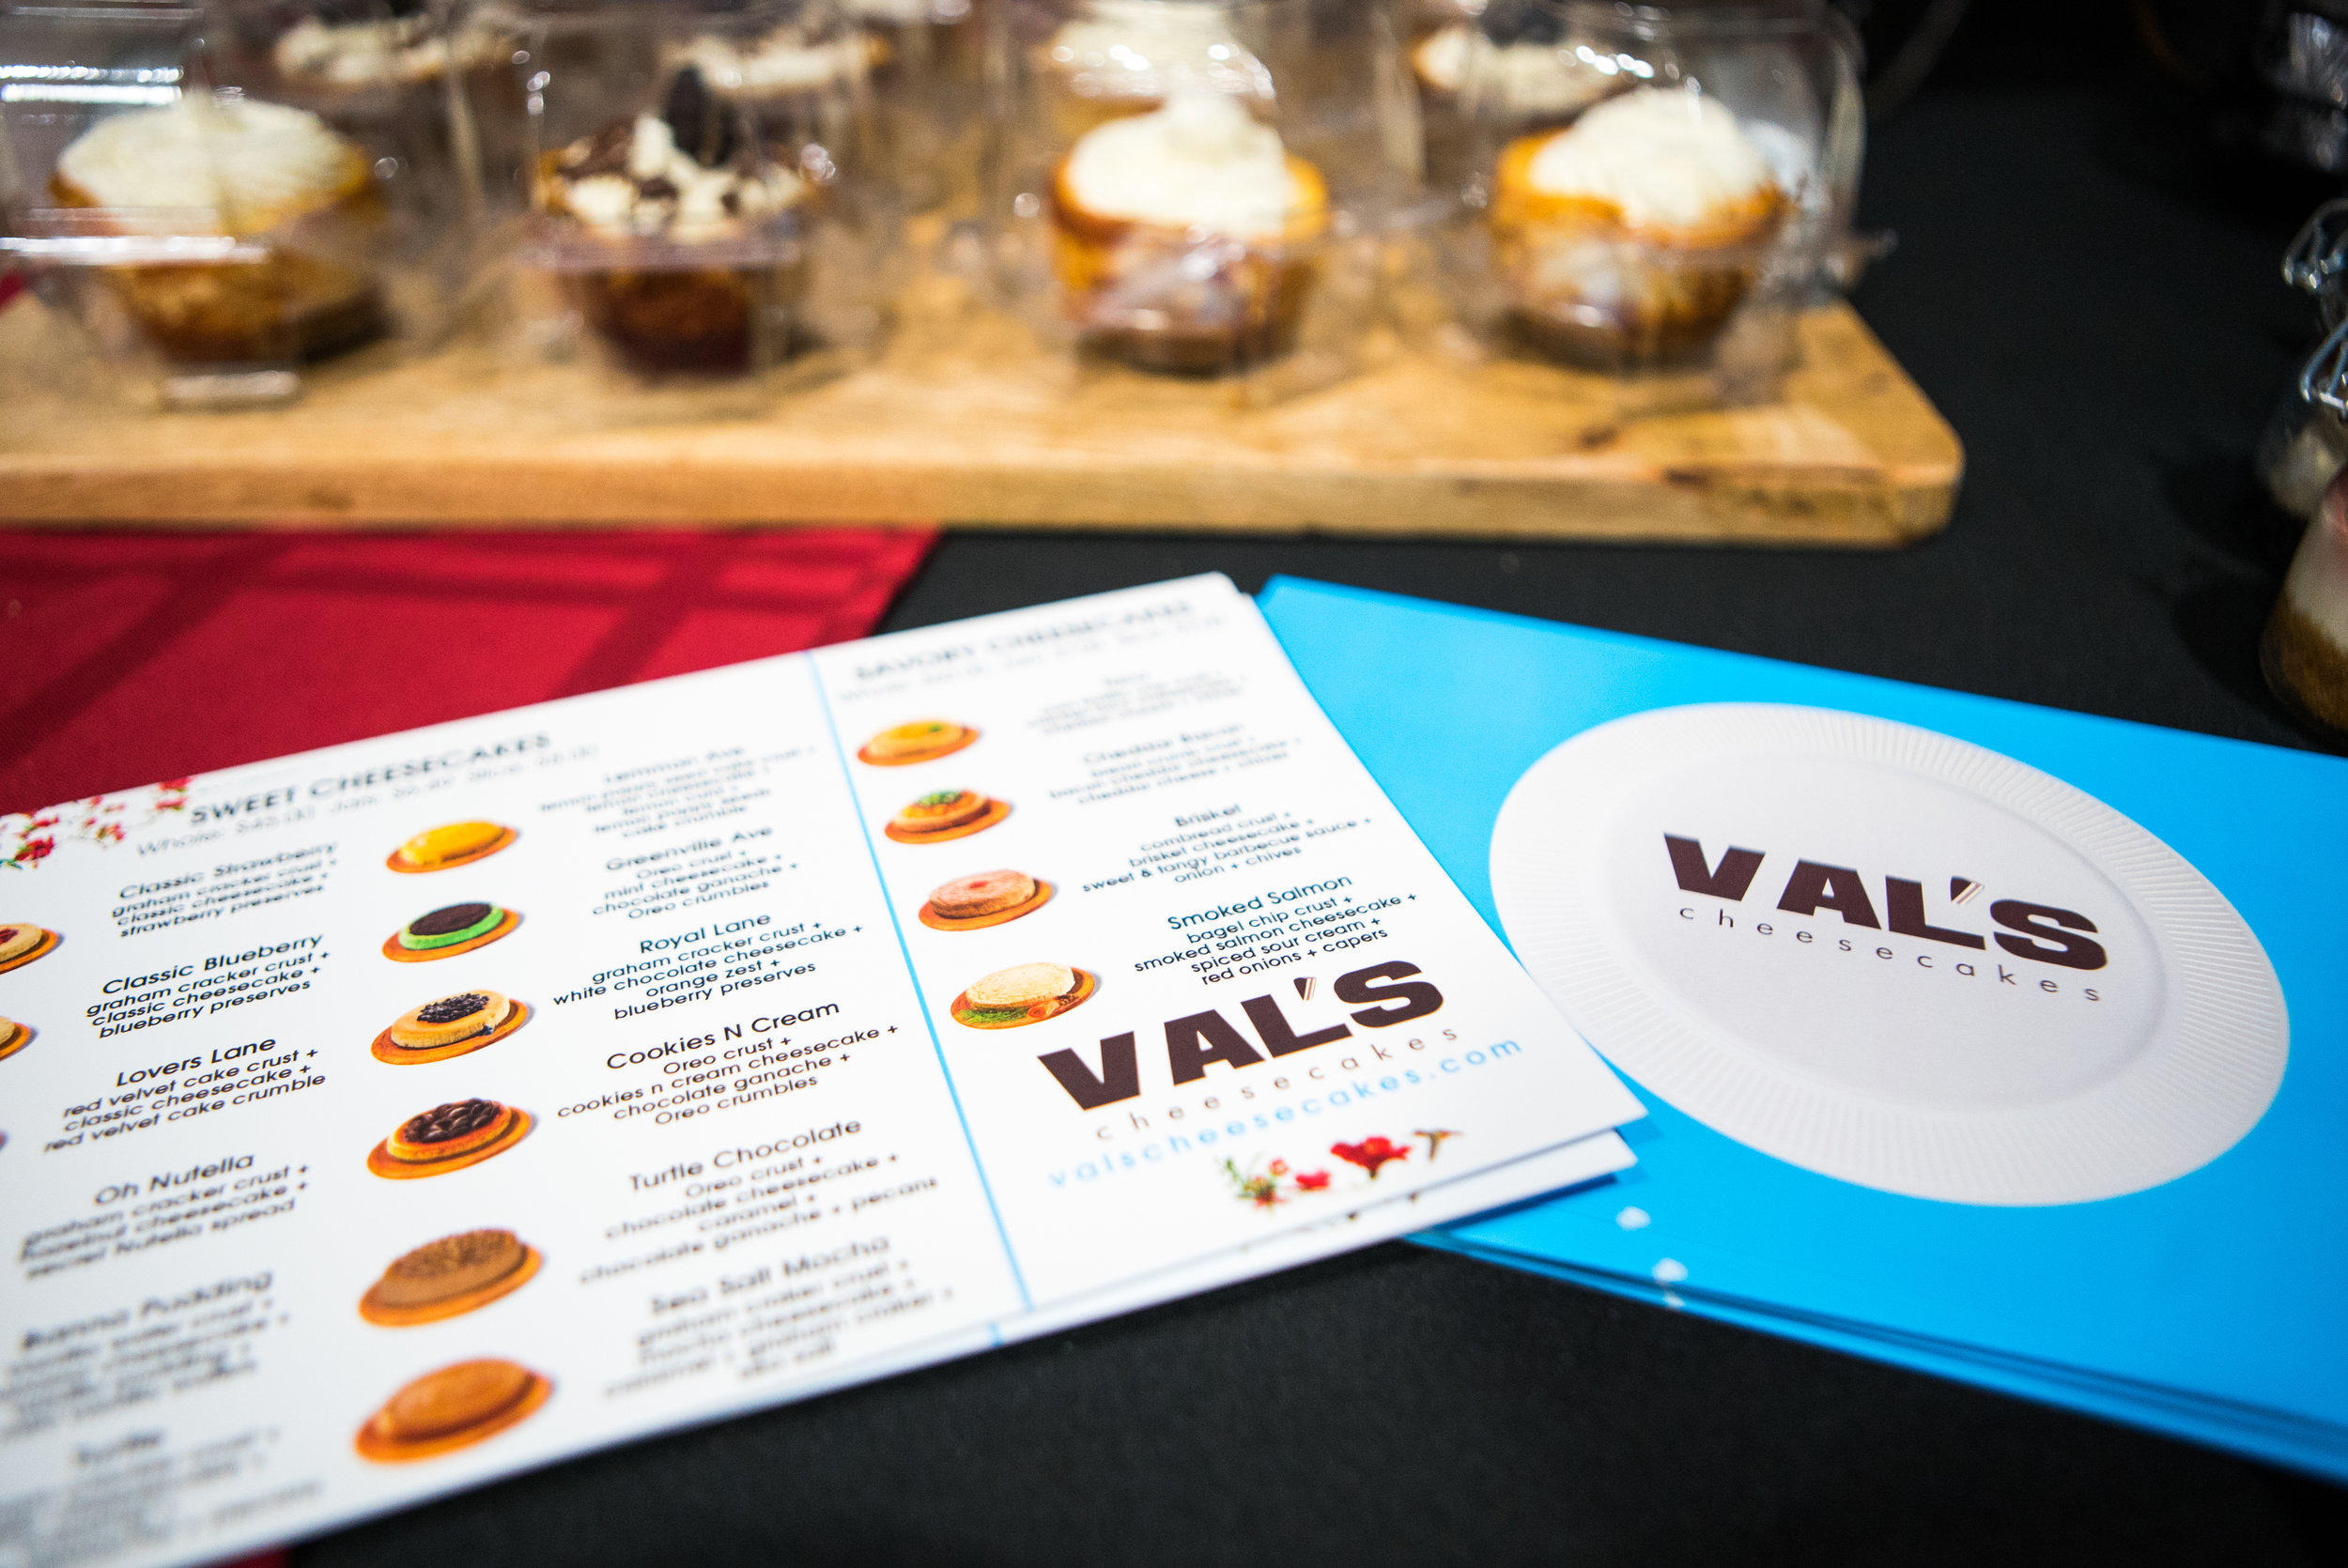 Vals Cheesecakes